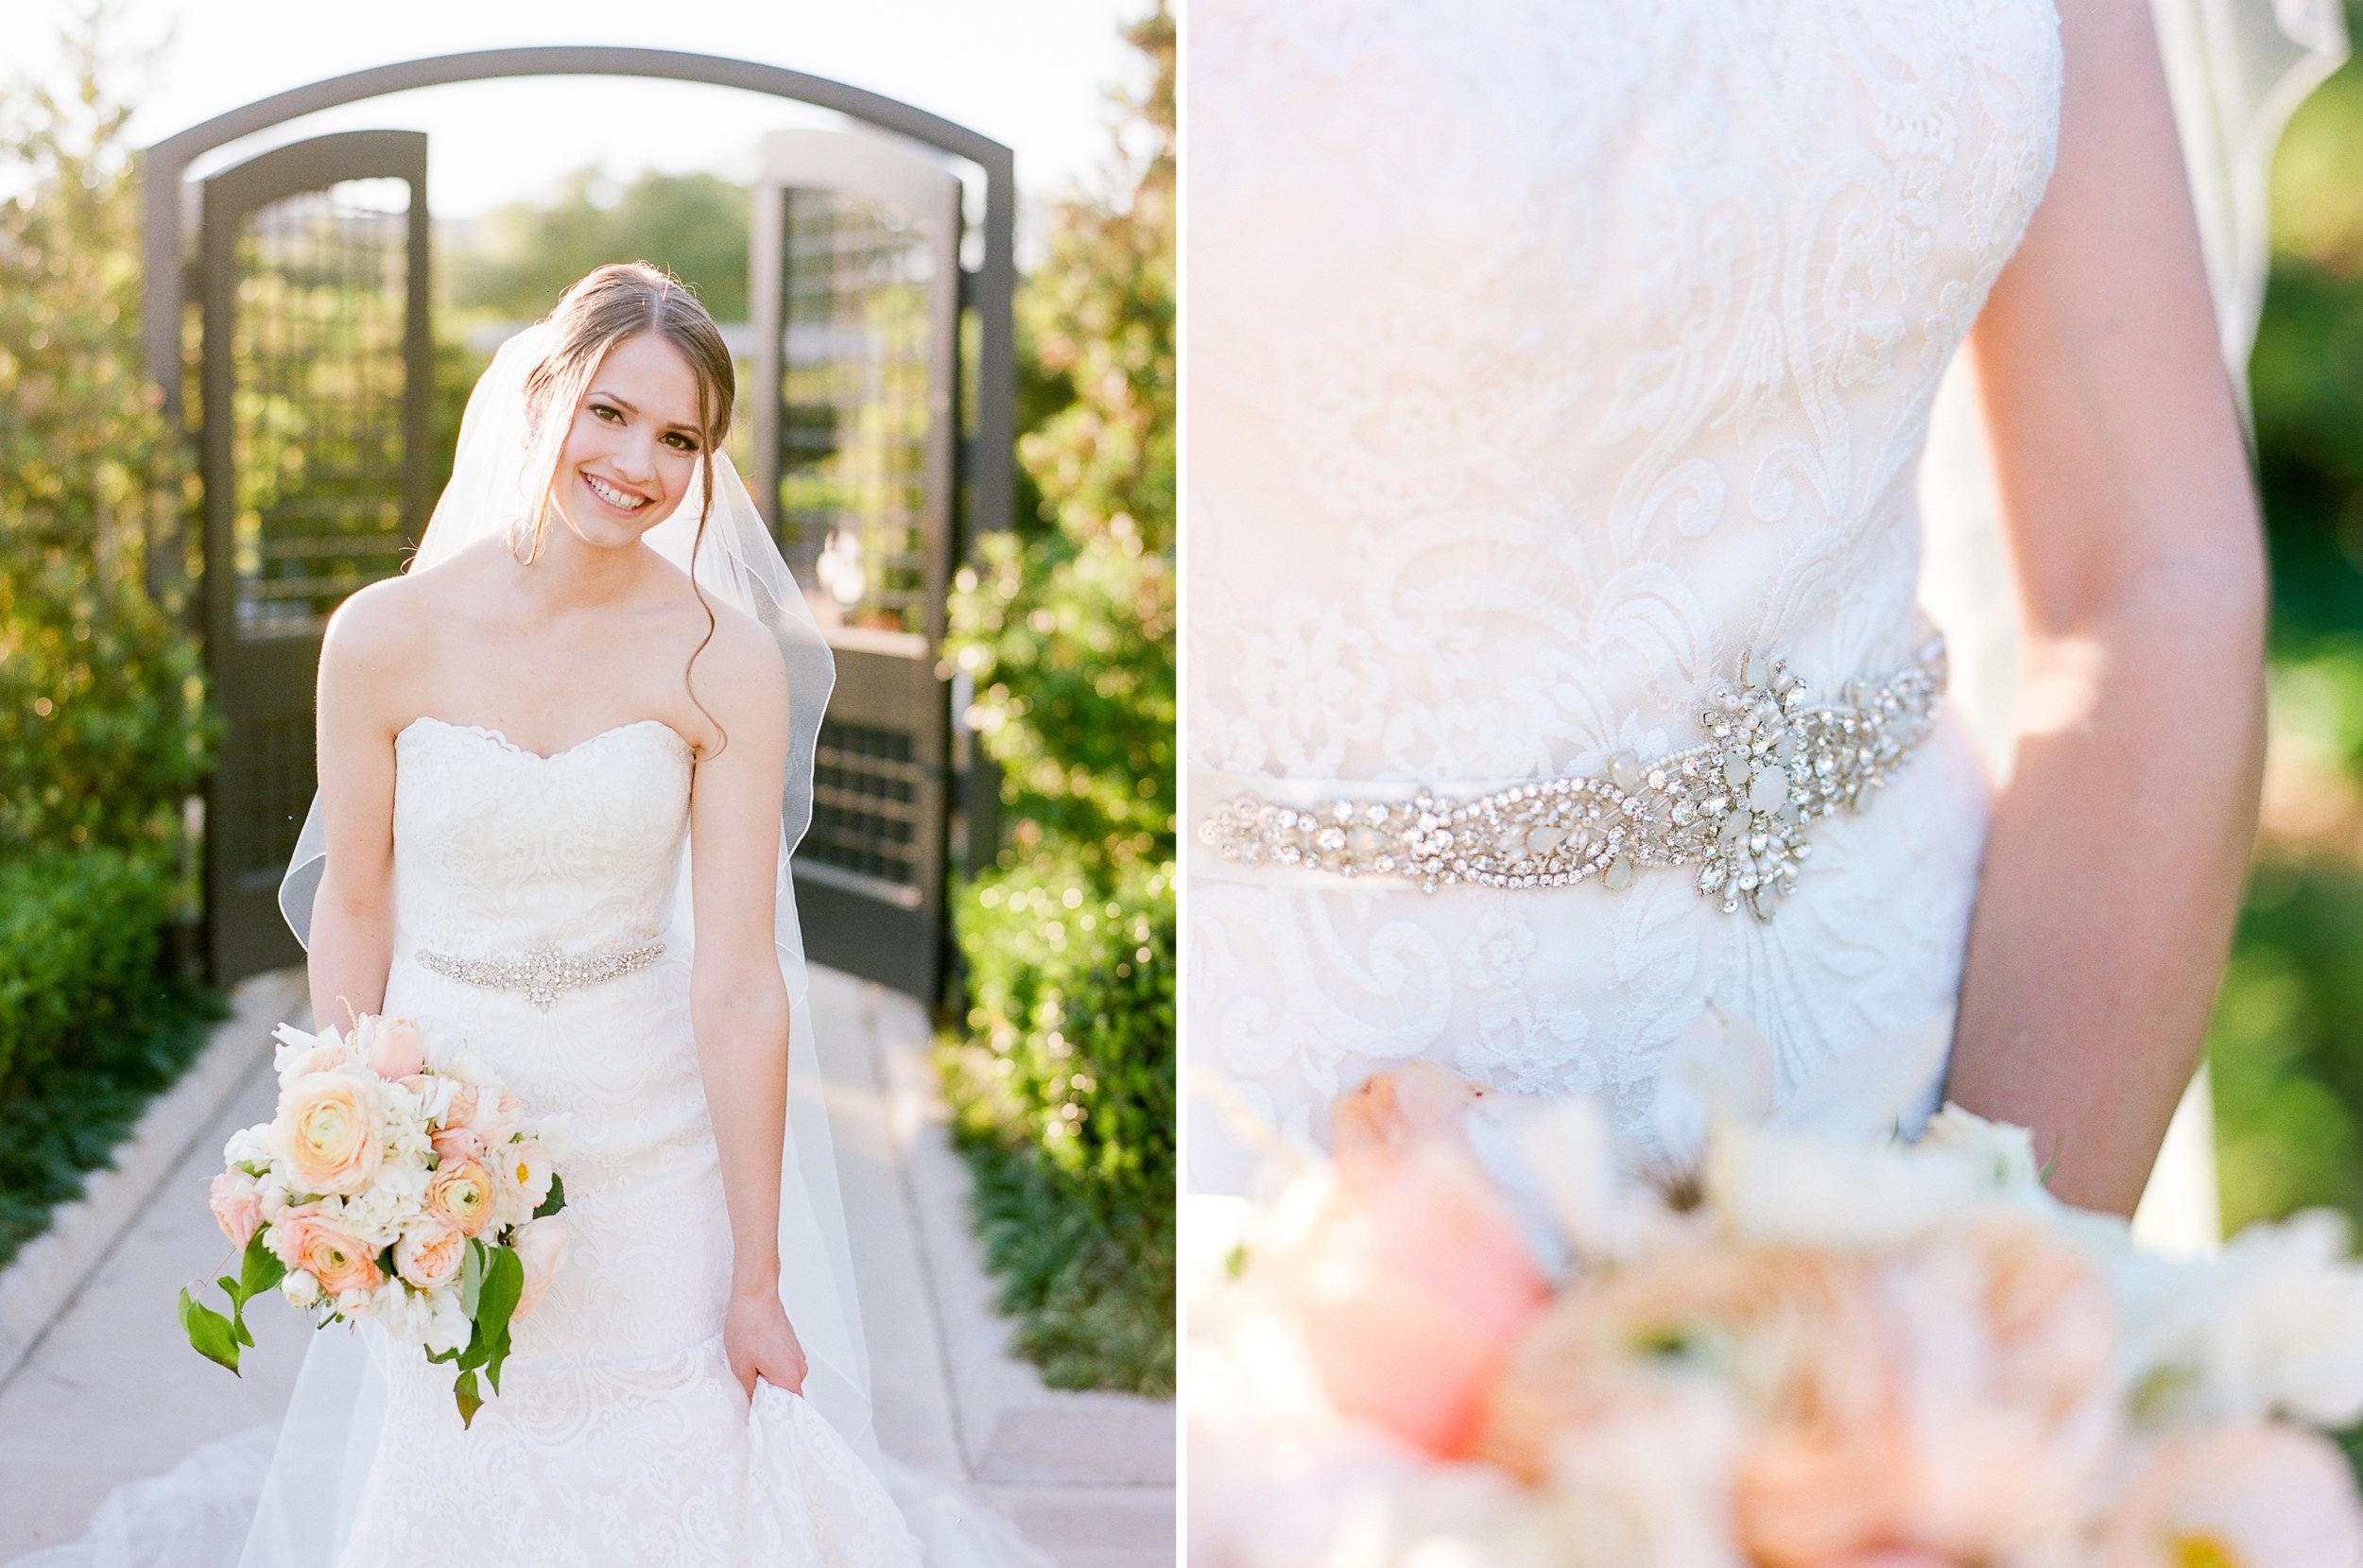 Houston-Wedding-Photographer-Film-Fine-Art-Bridals-Dana Fernandez-Photography-107.jpg